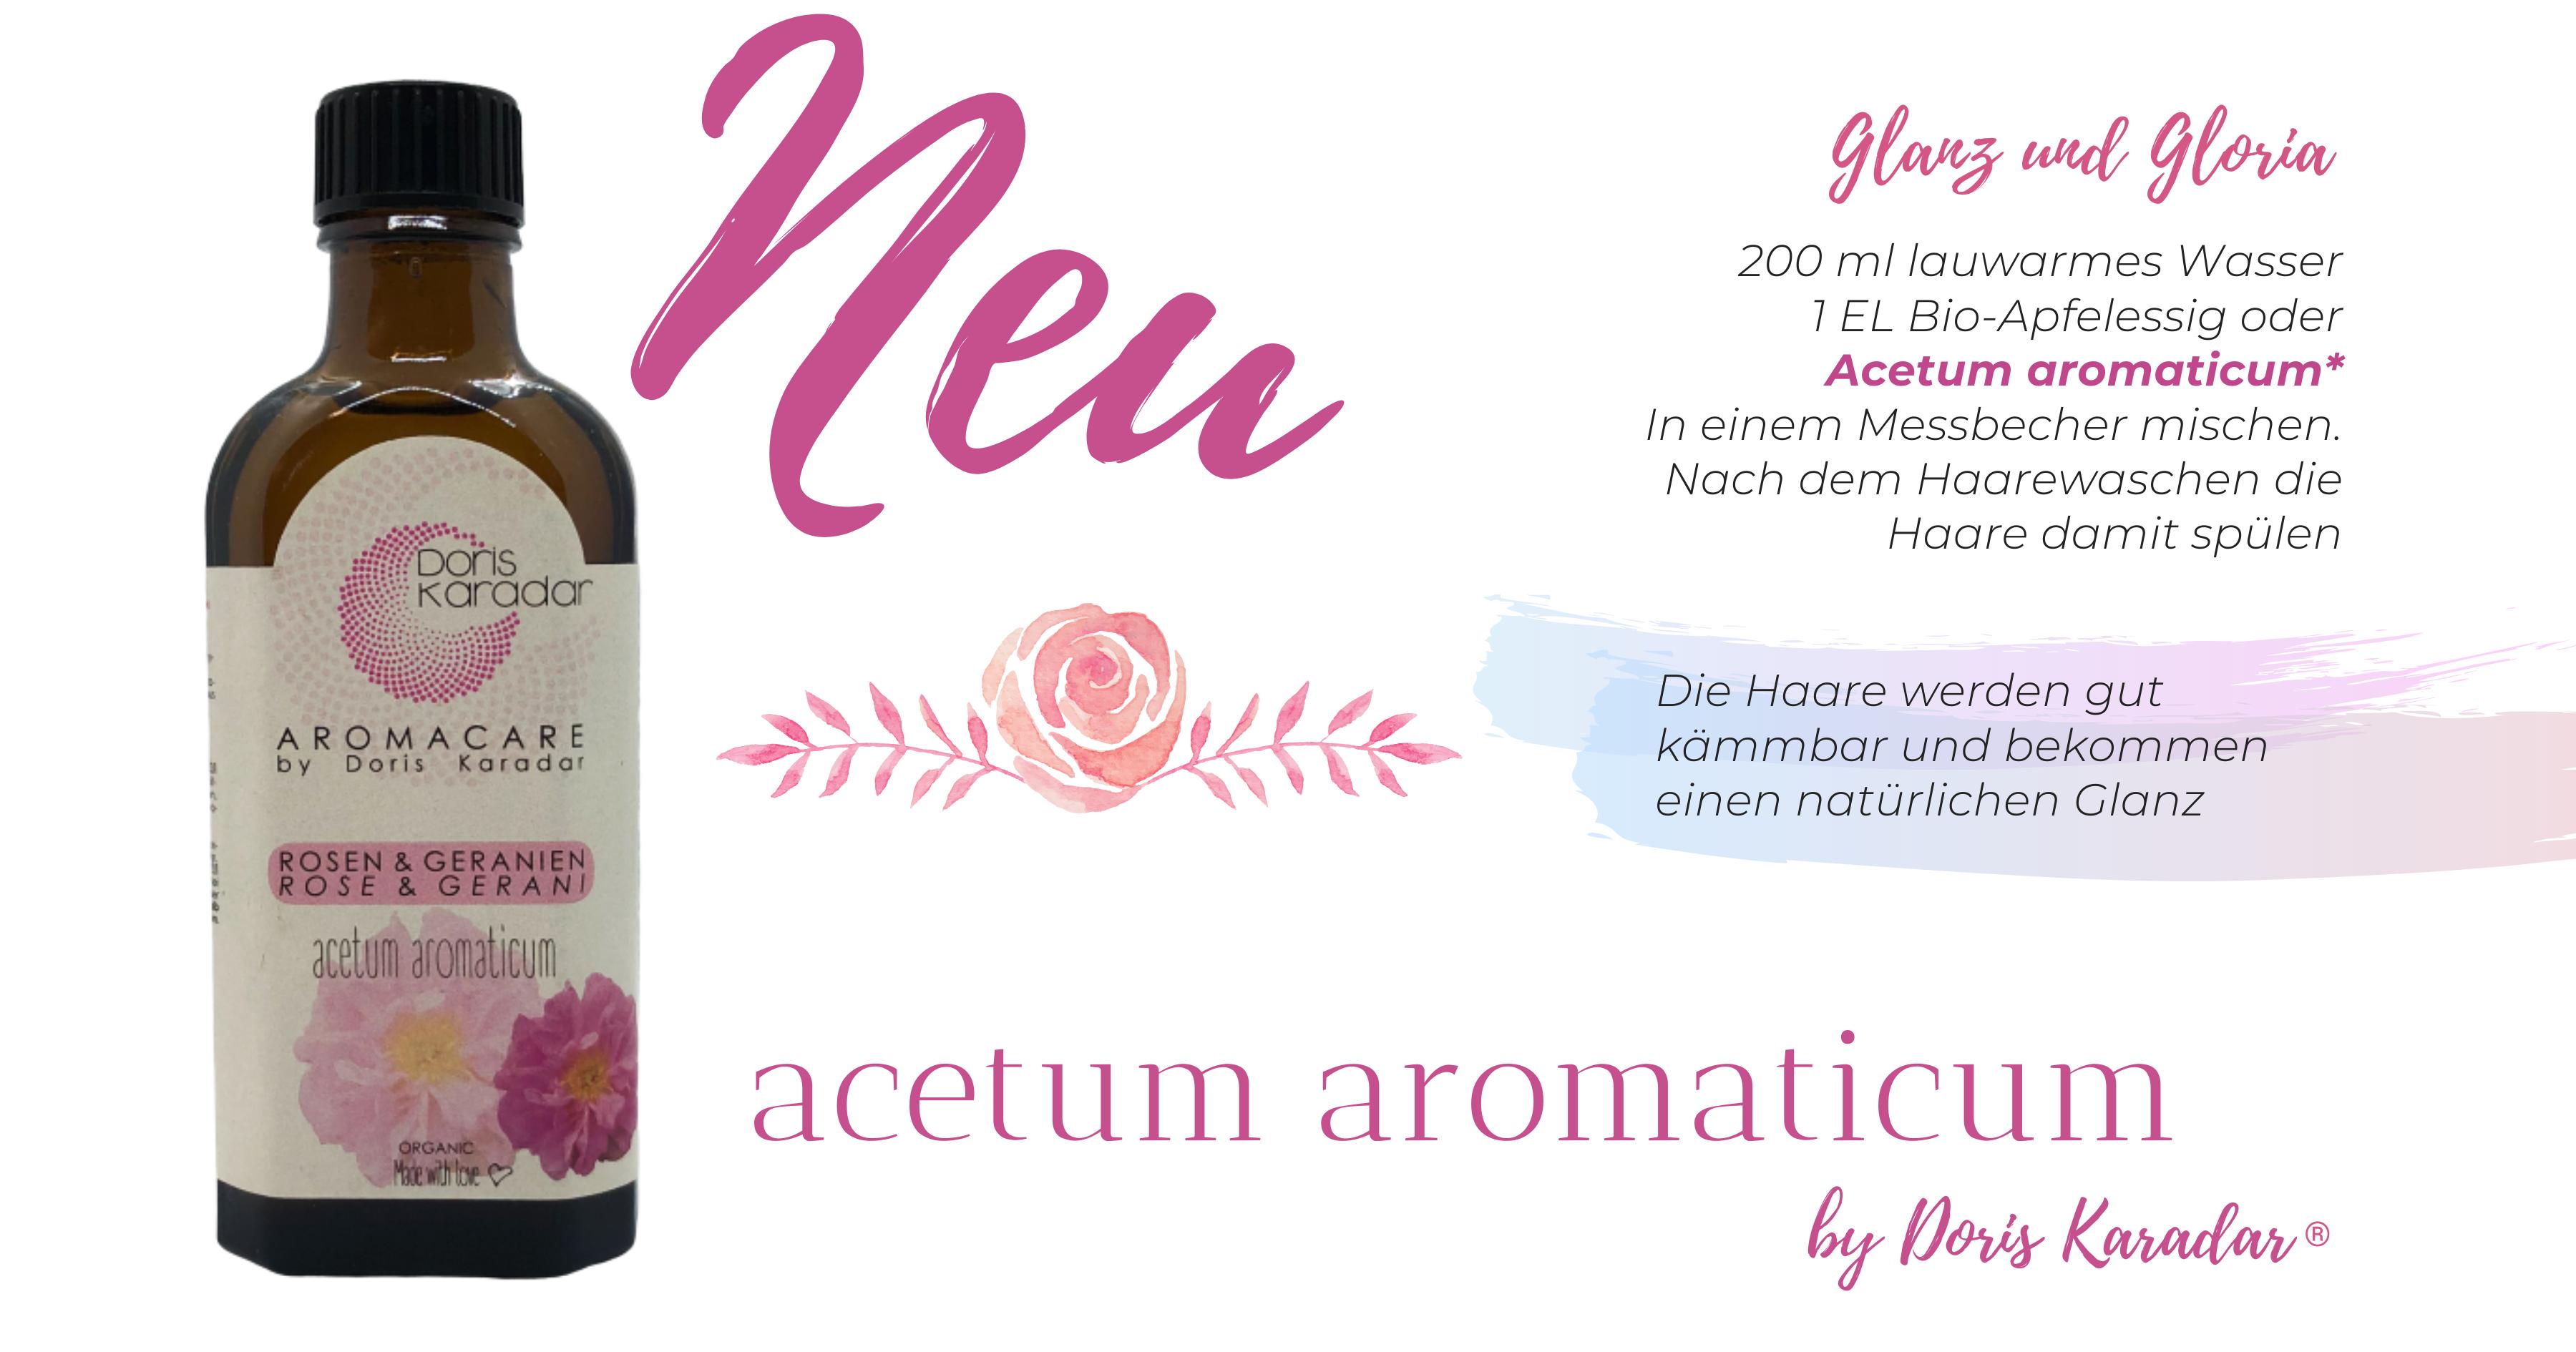 Neue Wege - Aromatherapie Webinare